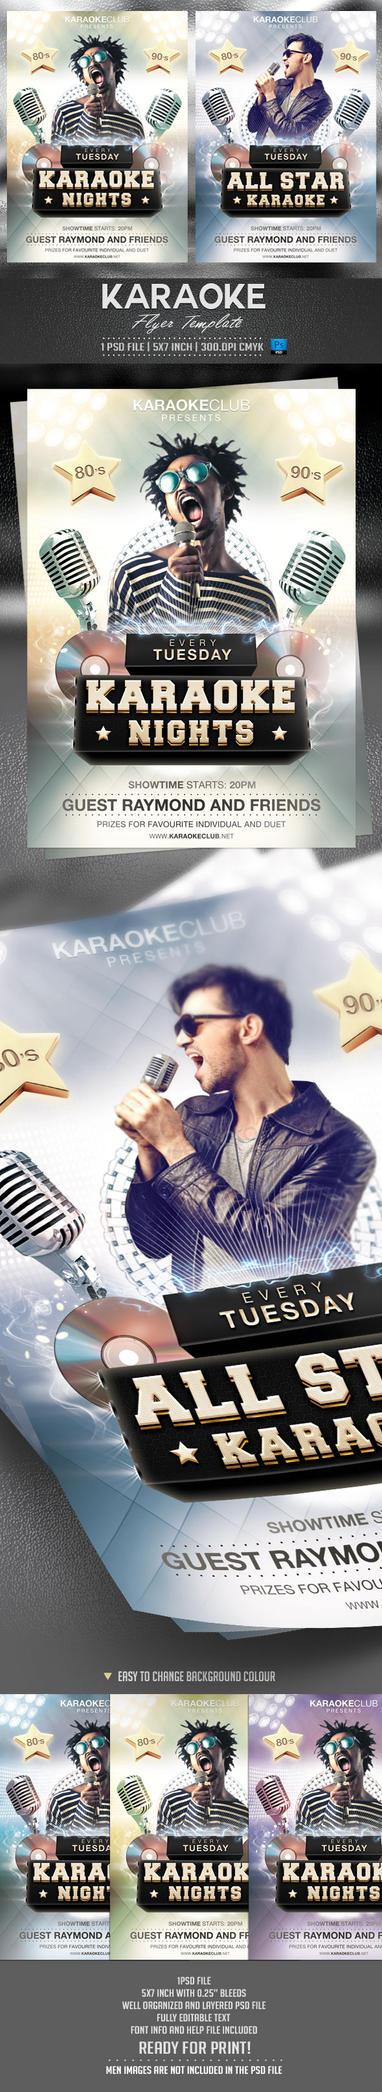 Karaoke Flyer Template by BriellDesign